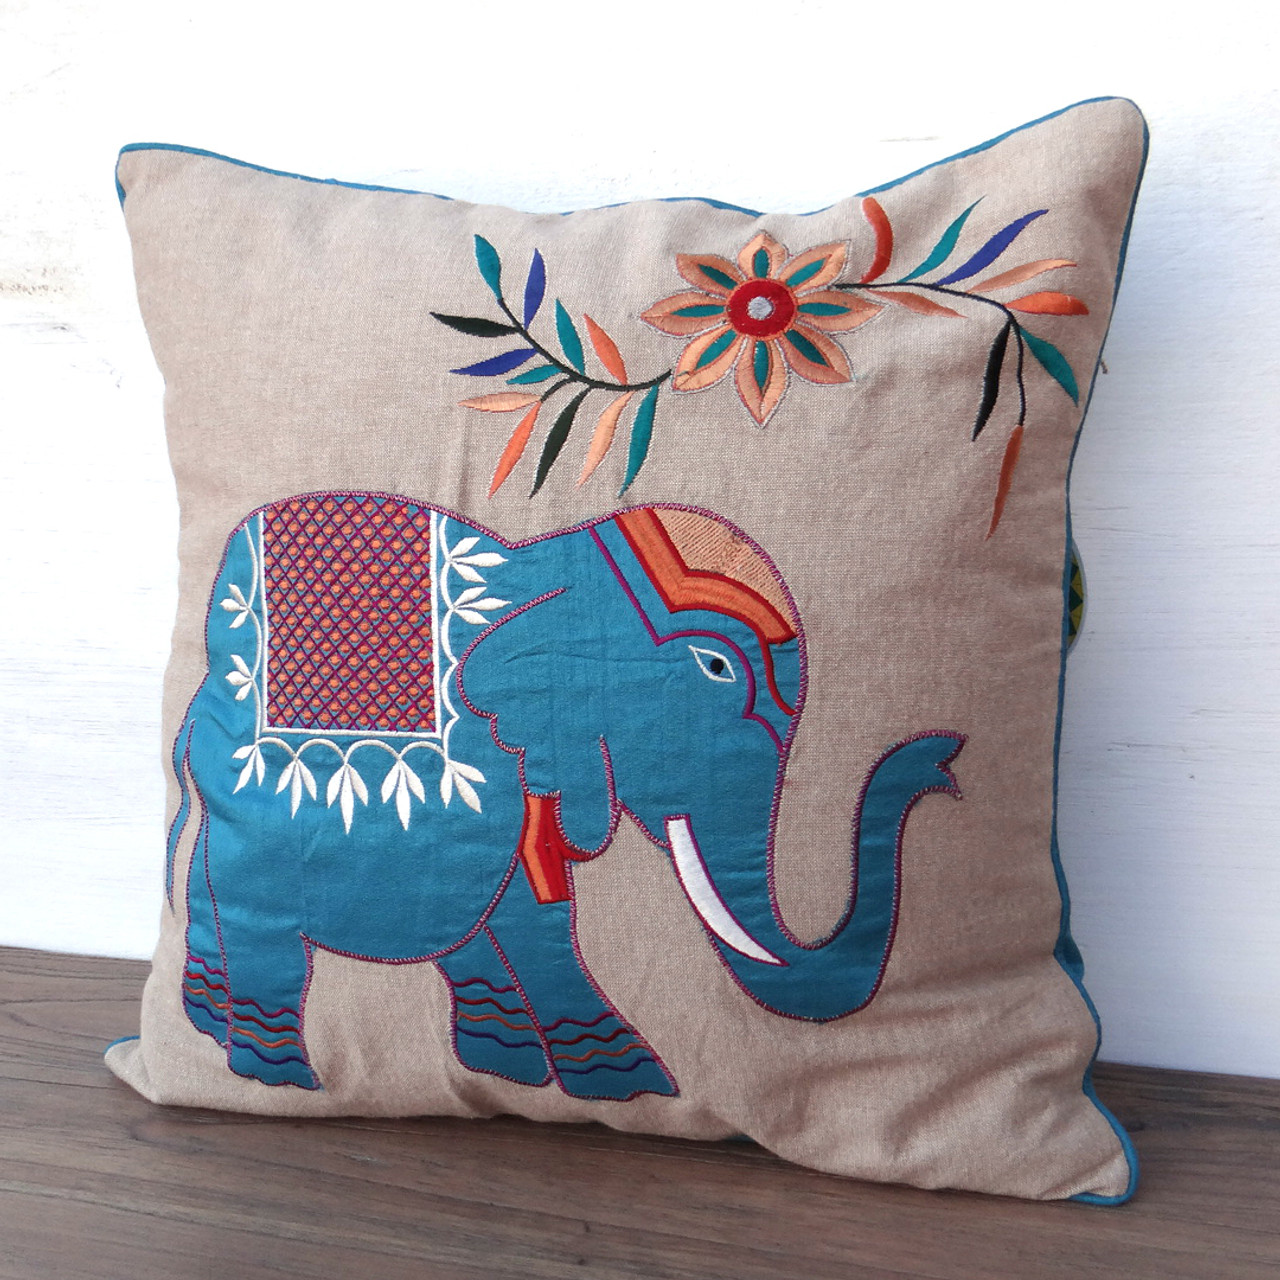 Embroidered Elephant Cushion Teal - Fair Trade   Present Company